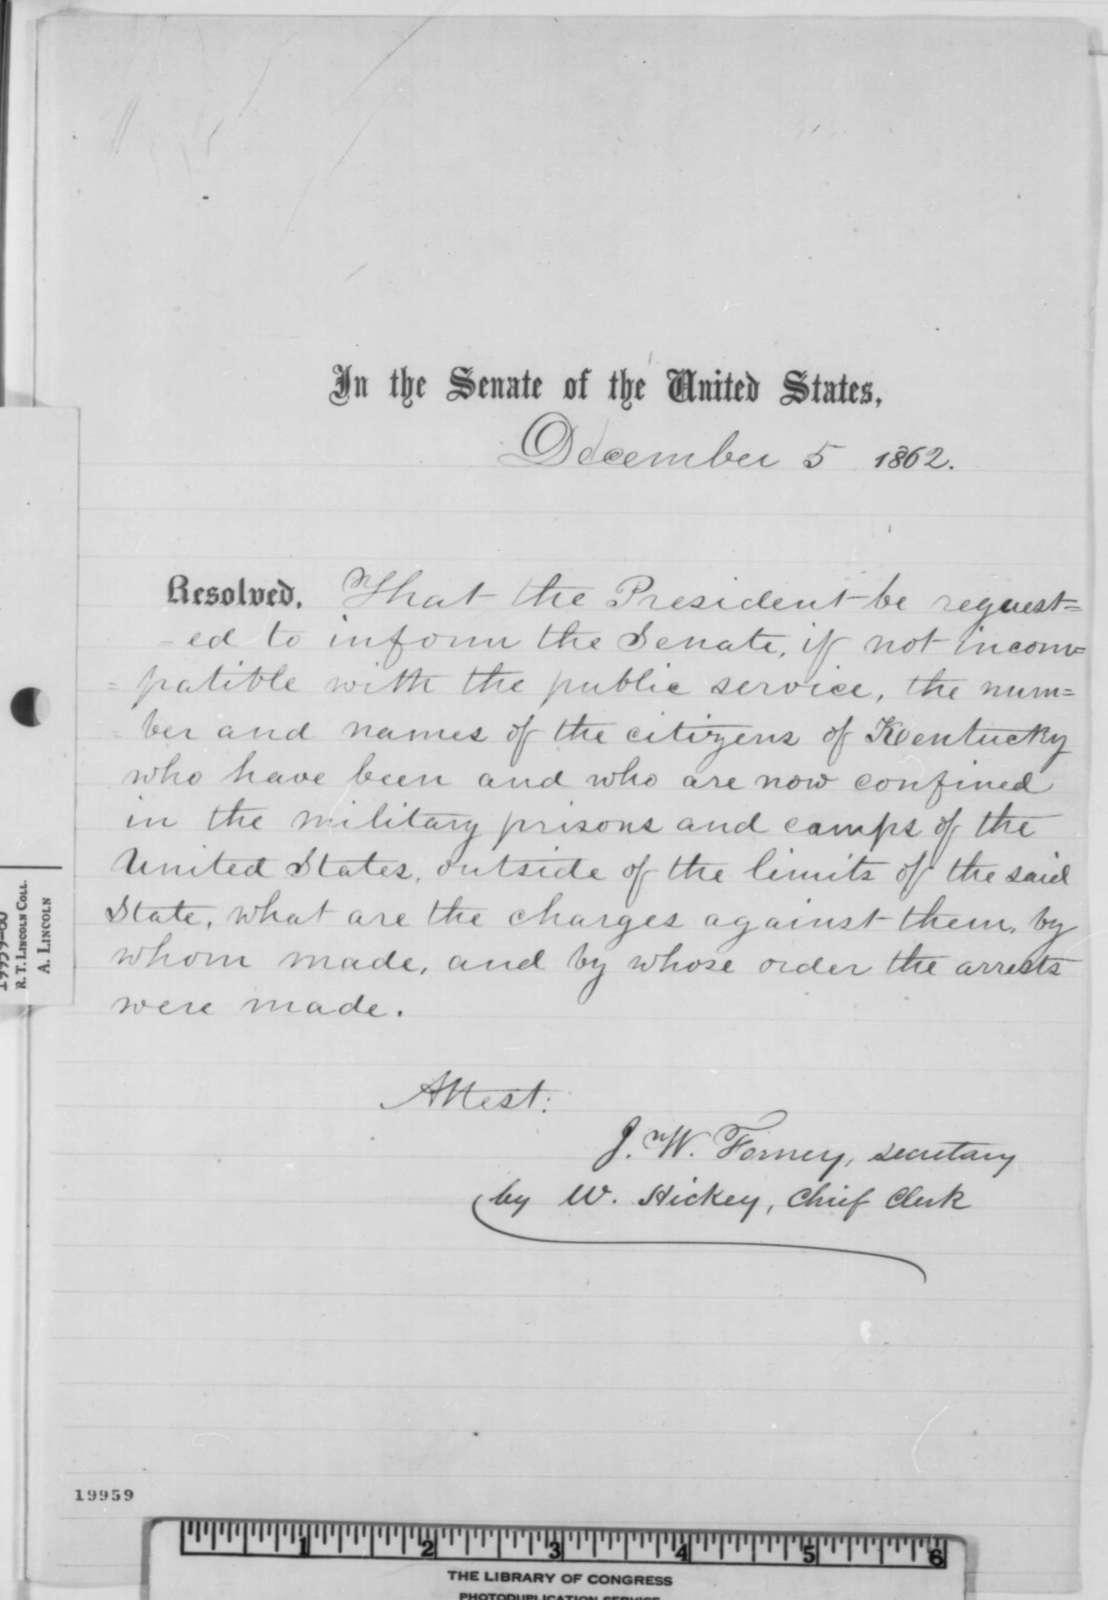 Senate, Friday, December 05, 1862  (Resolution concerning military arrests in Kentucky)